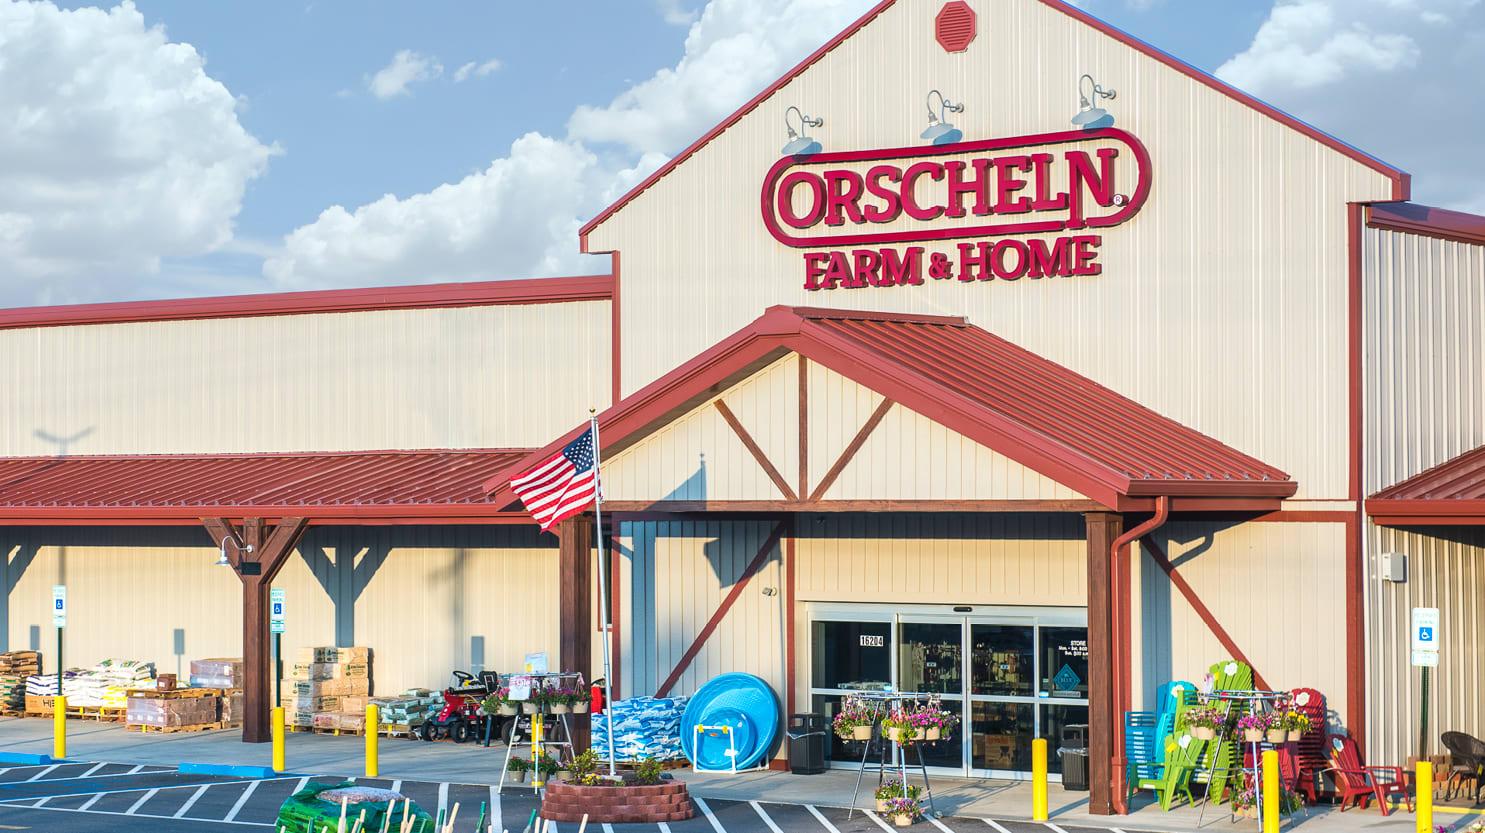 Front view of Orscheln Farm & Home Store in Murray, Kentucky 42071